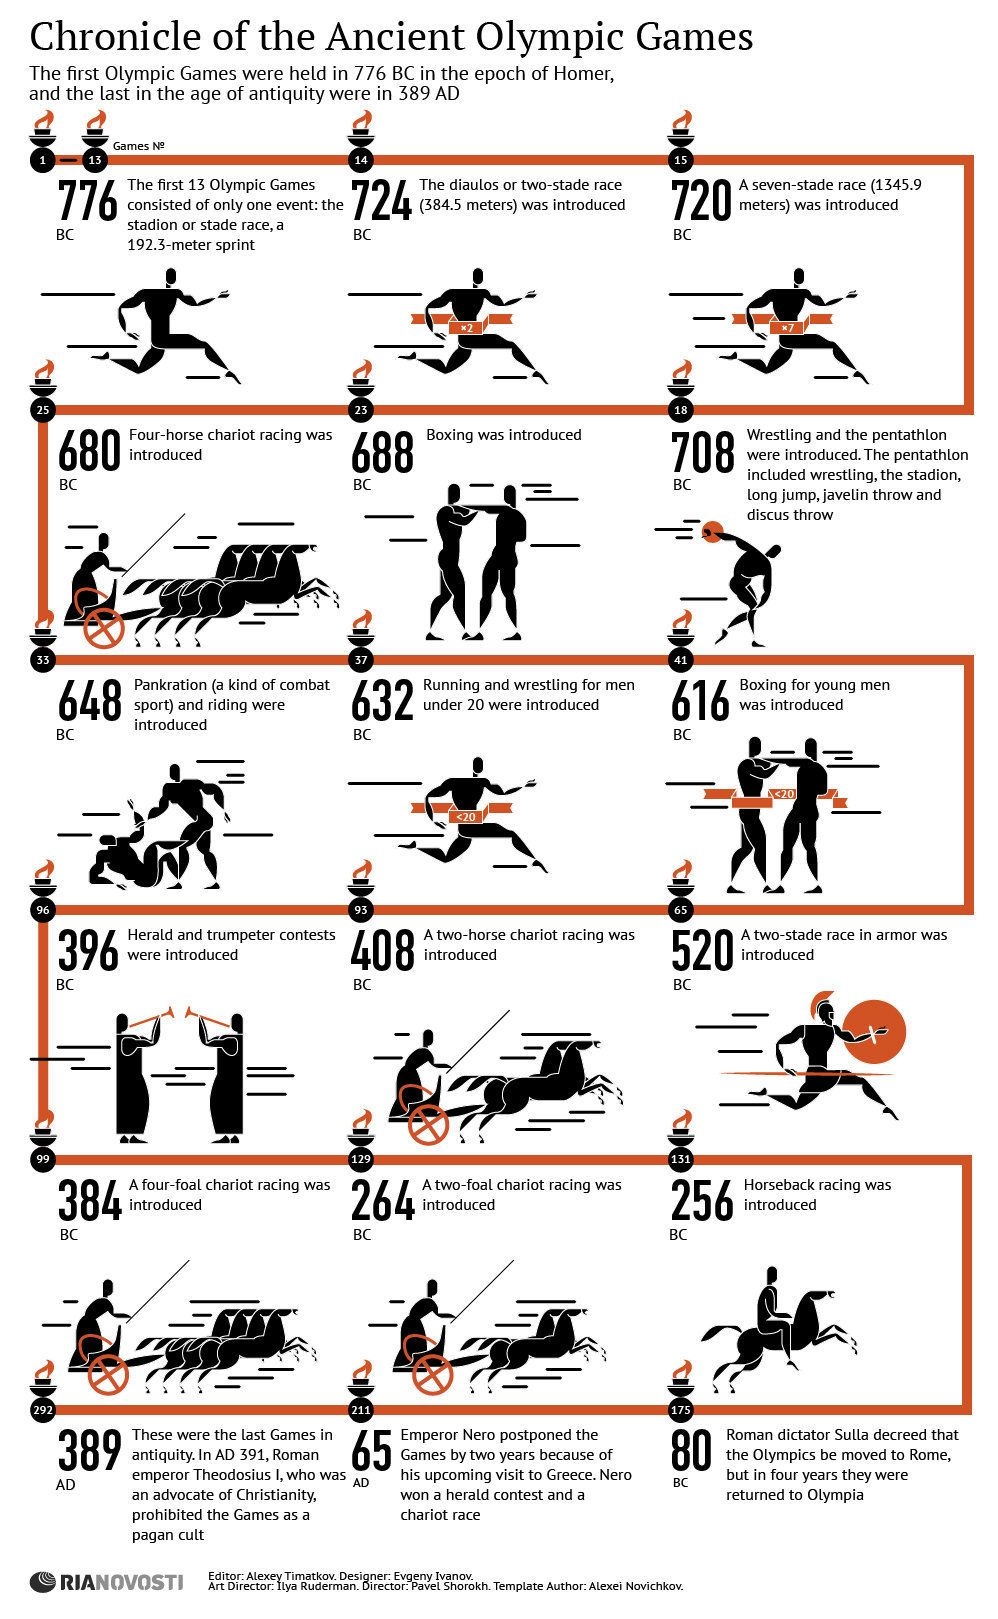 Development of Olympic games Инфографика-Древна-Олимпиада.jpg (998×1619)